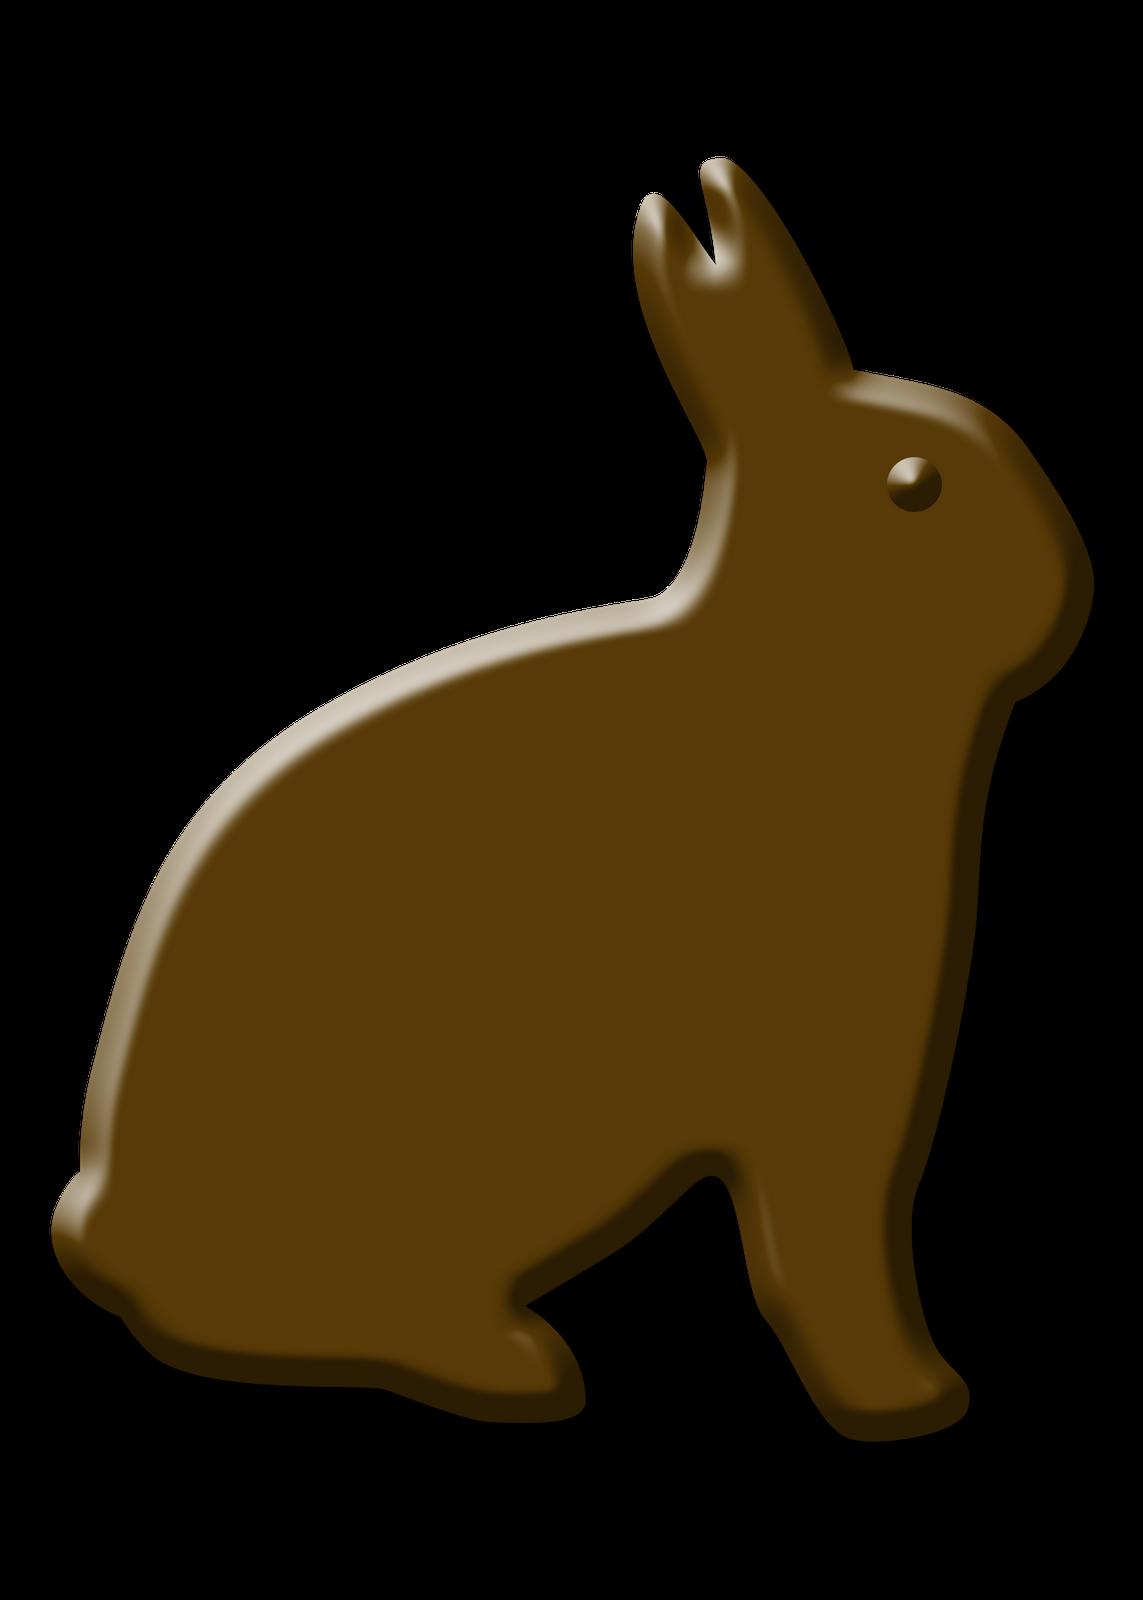 Chocolate Rabbit Clipart